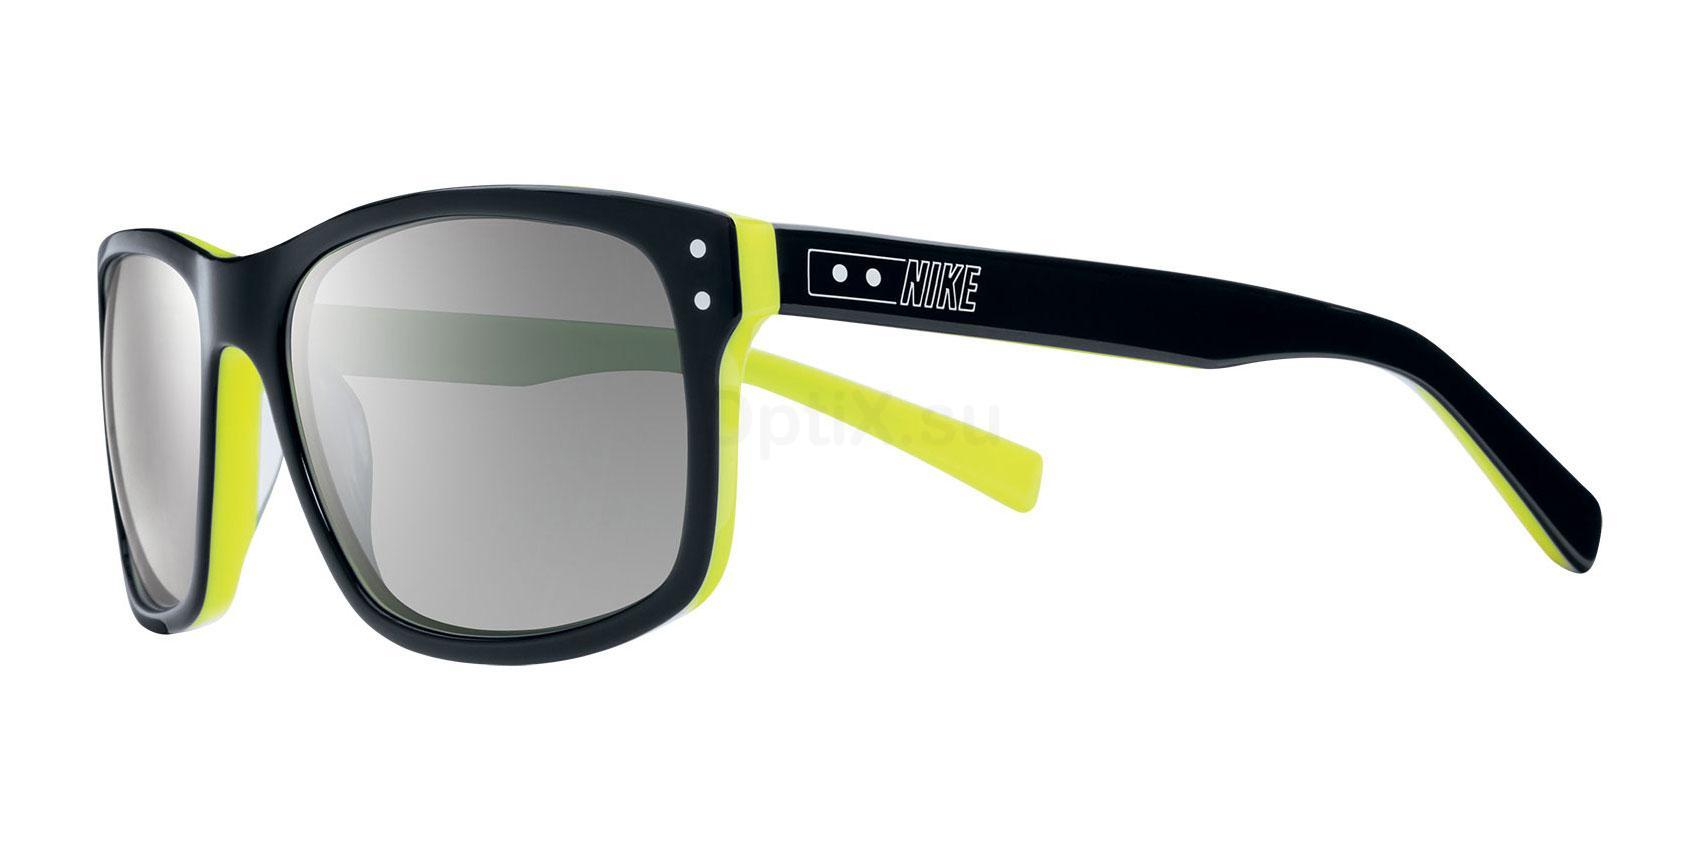 007 VINTAGE 80 EV0632 (2/2) , Nike